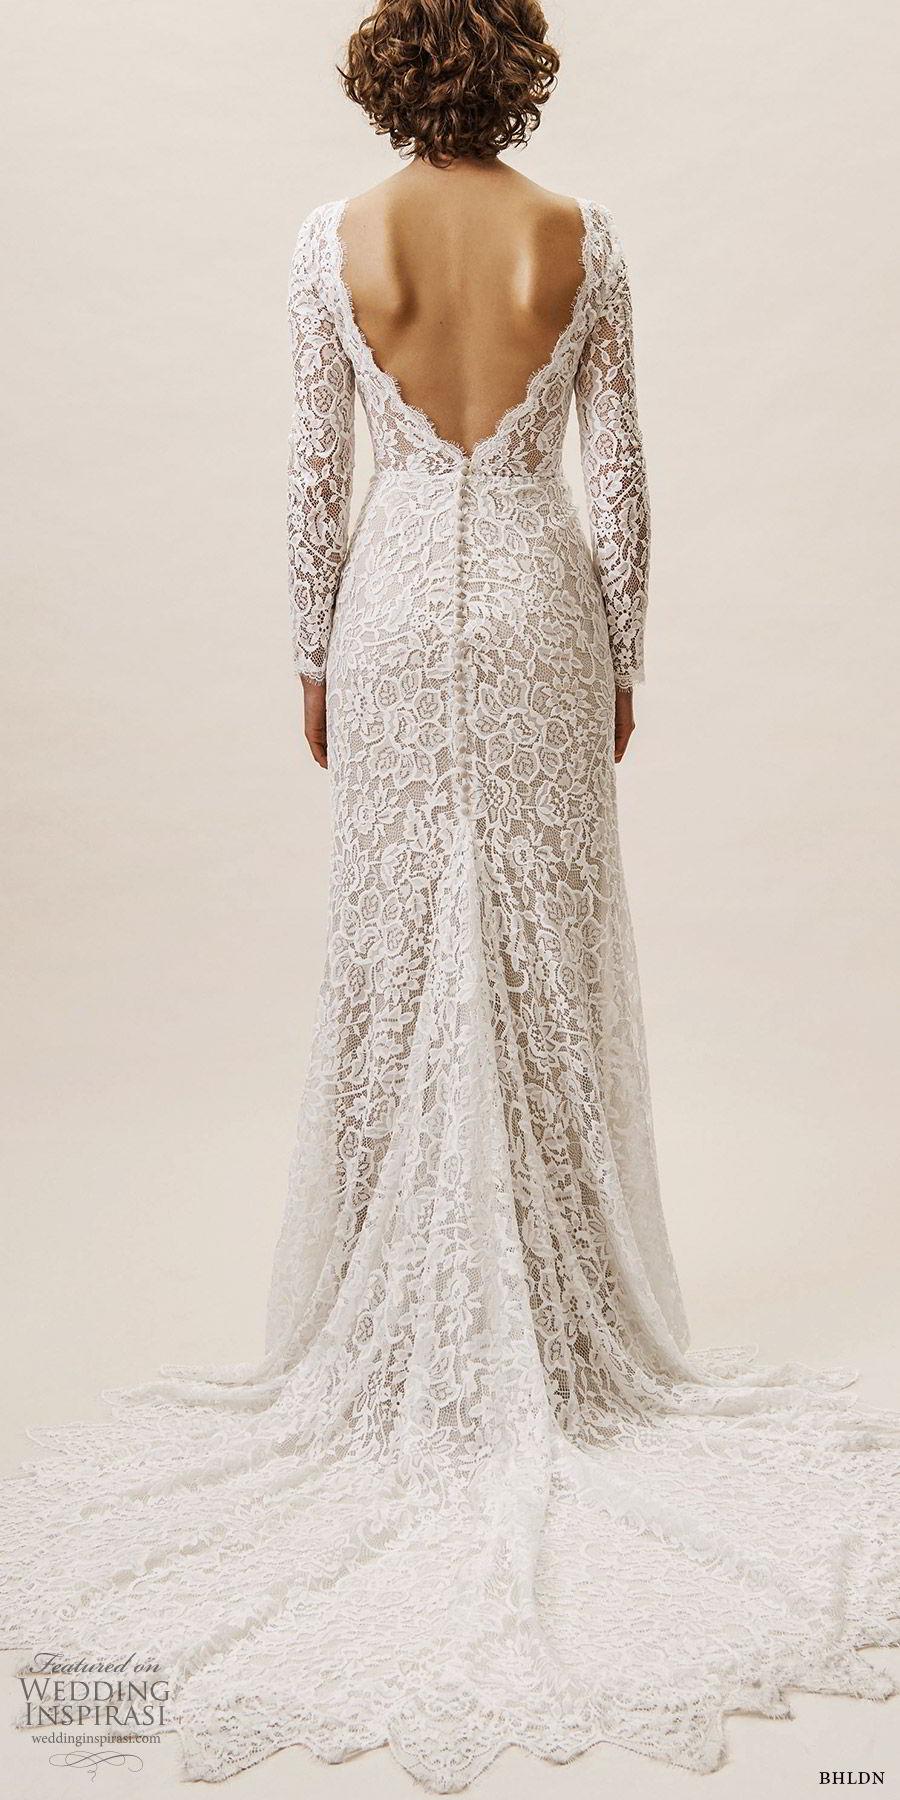 bhldn spring 2019 bridal illusion long sleeves v neckline sheath lace wedding dress low back chapel train (14) bv